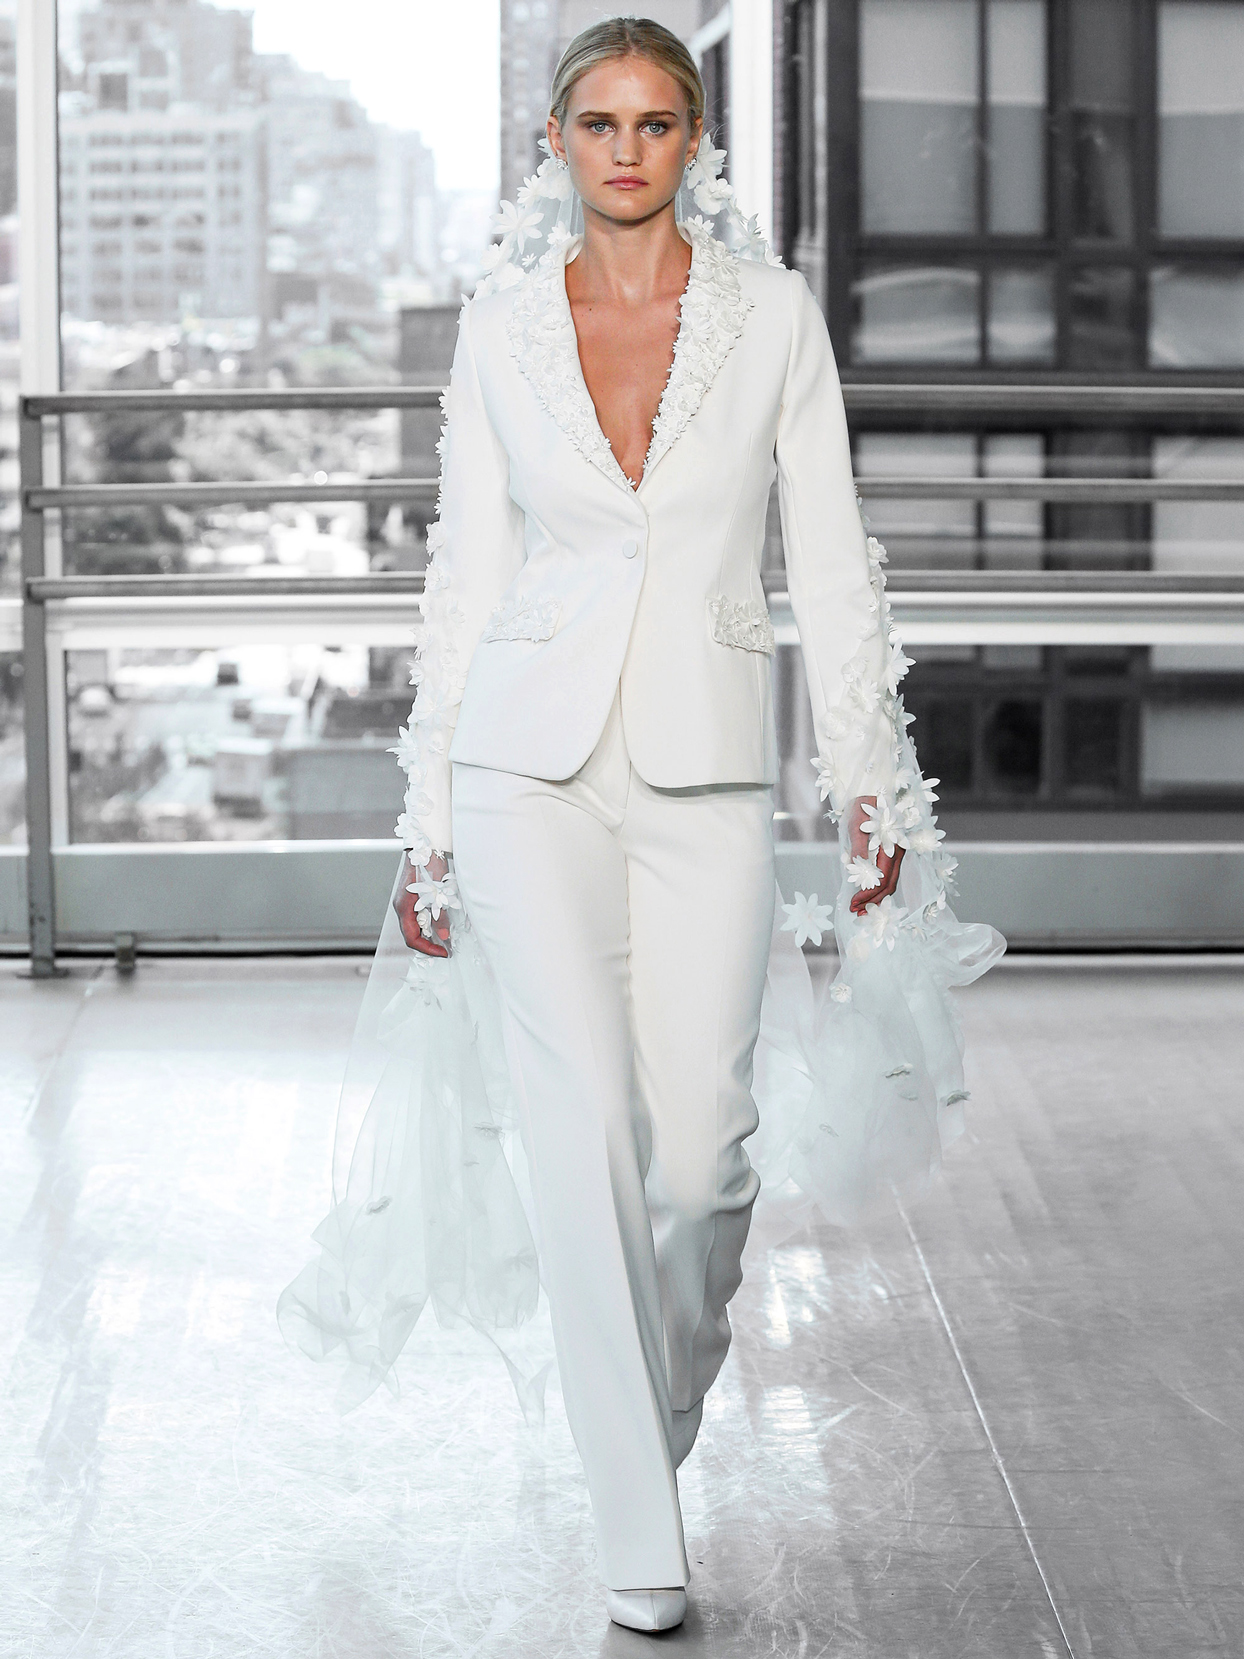 Justin Alexander Signature crepe pantsuit 3d flower accent wedding dress fall 2020